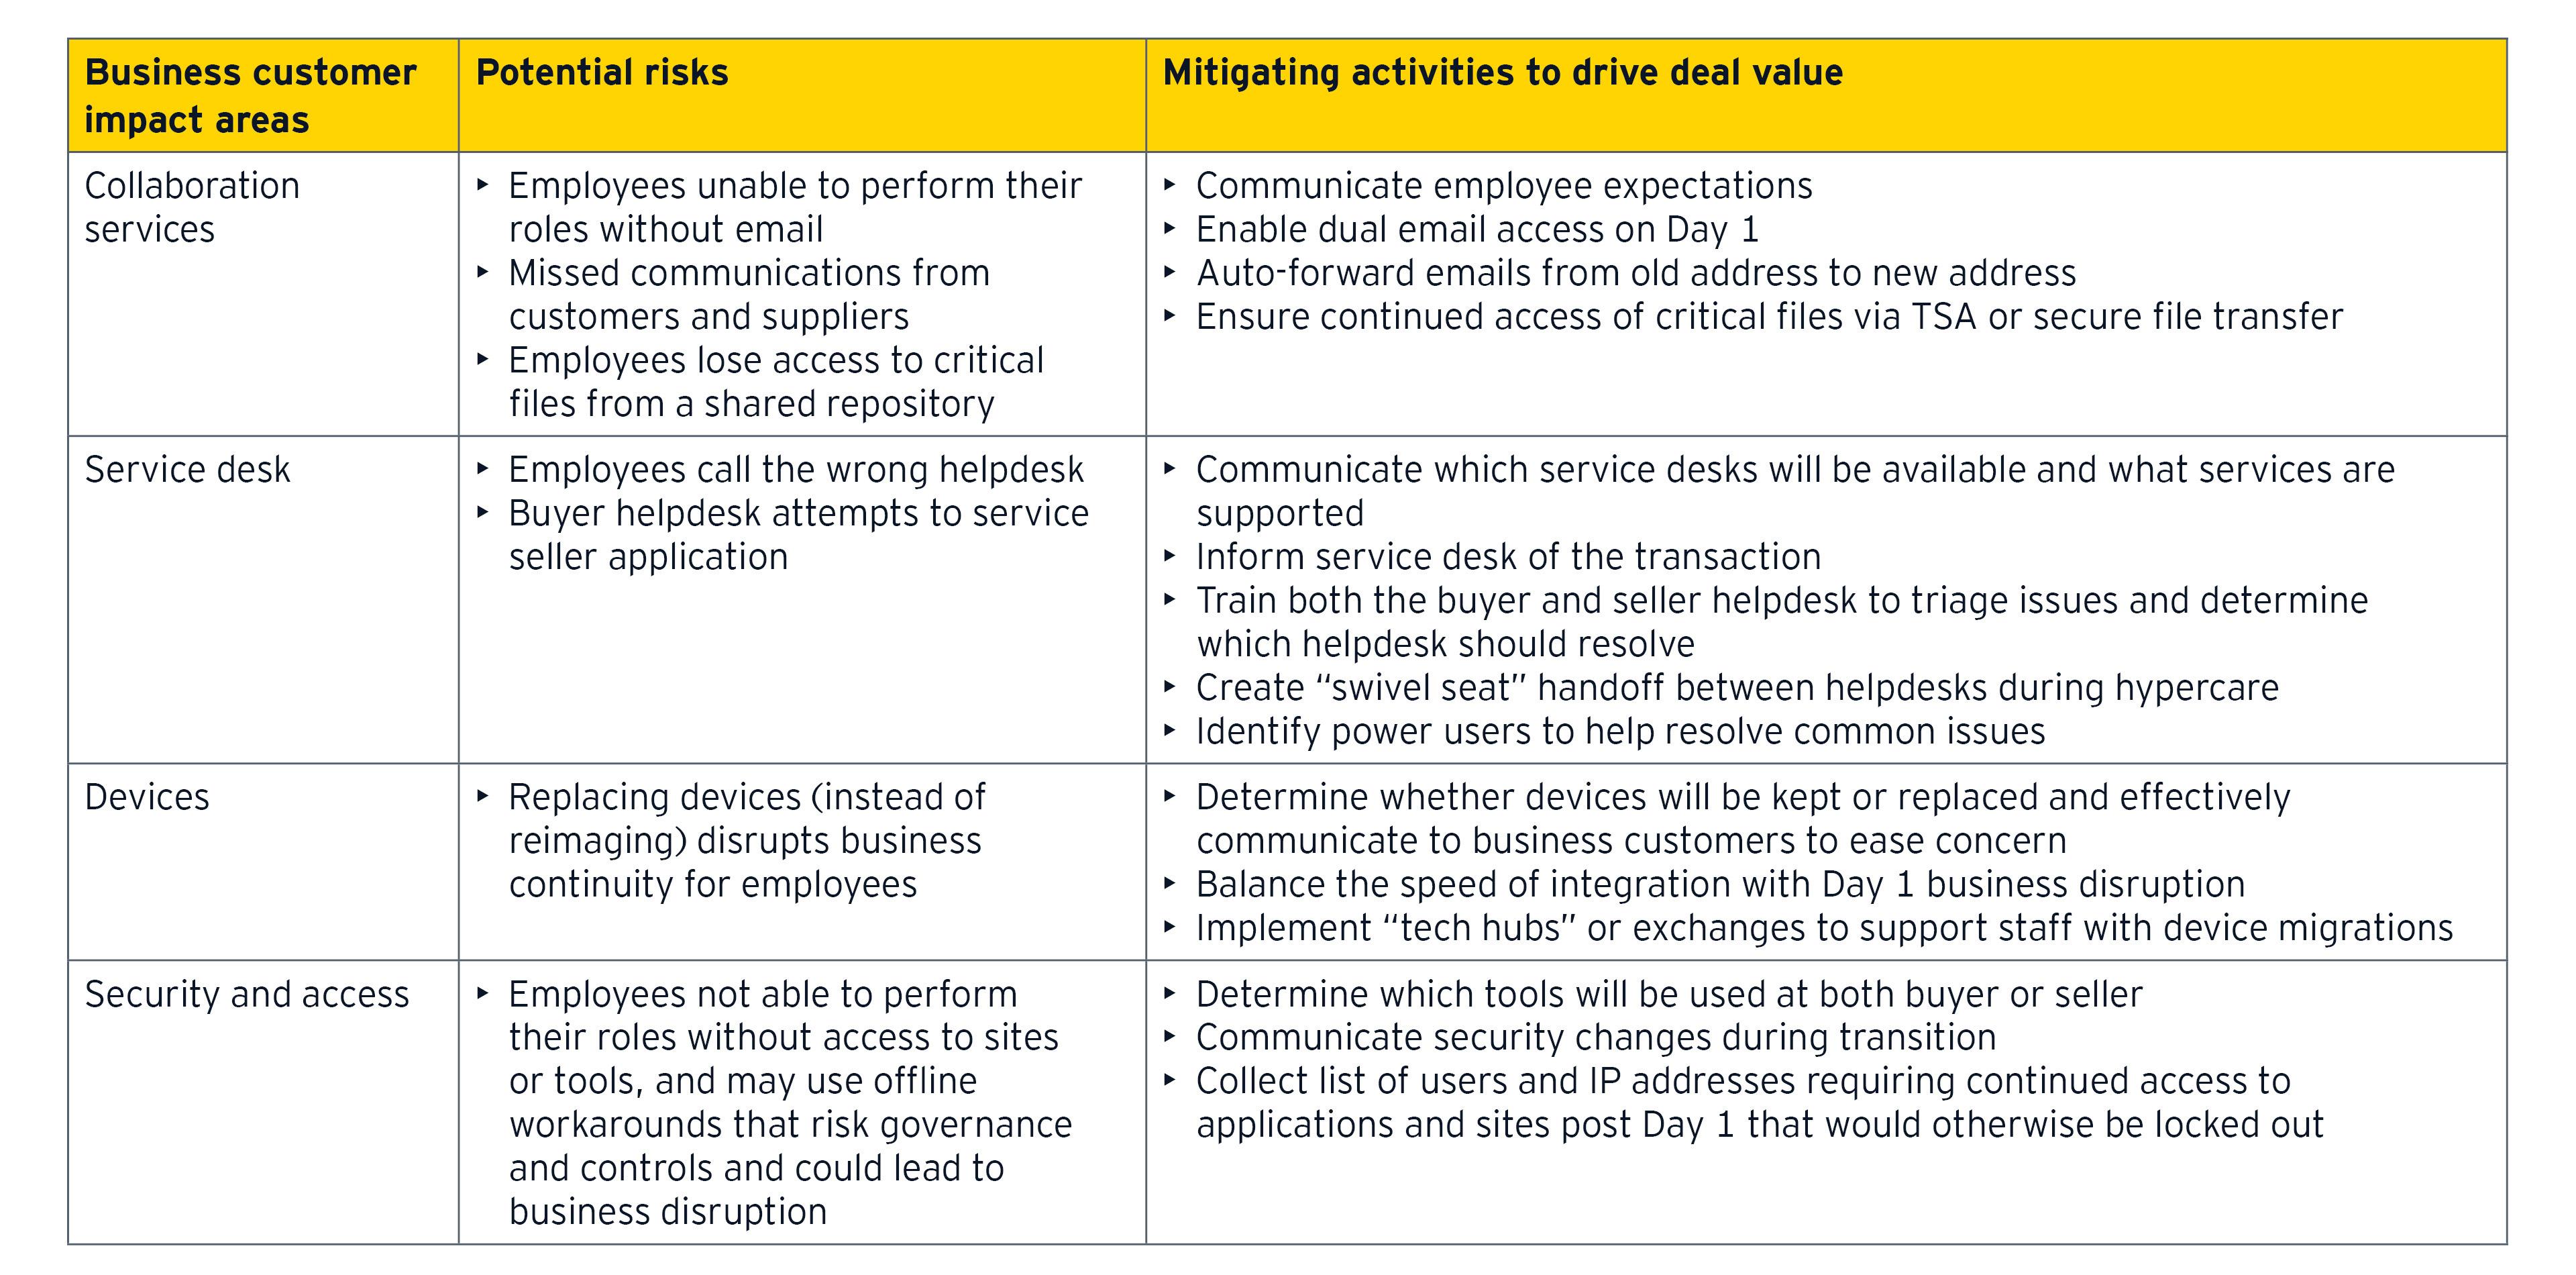 EY - Business customer impact